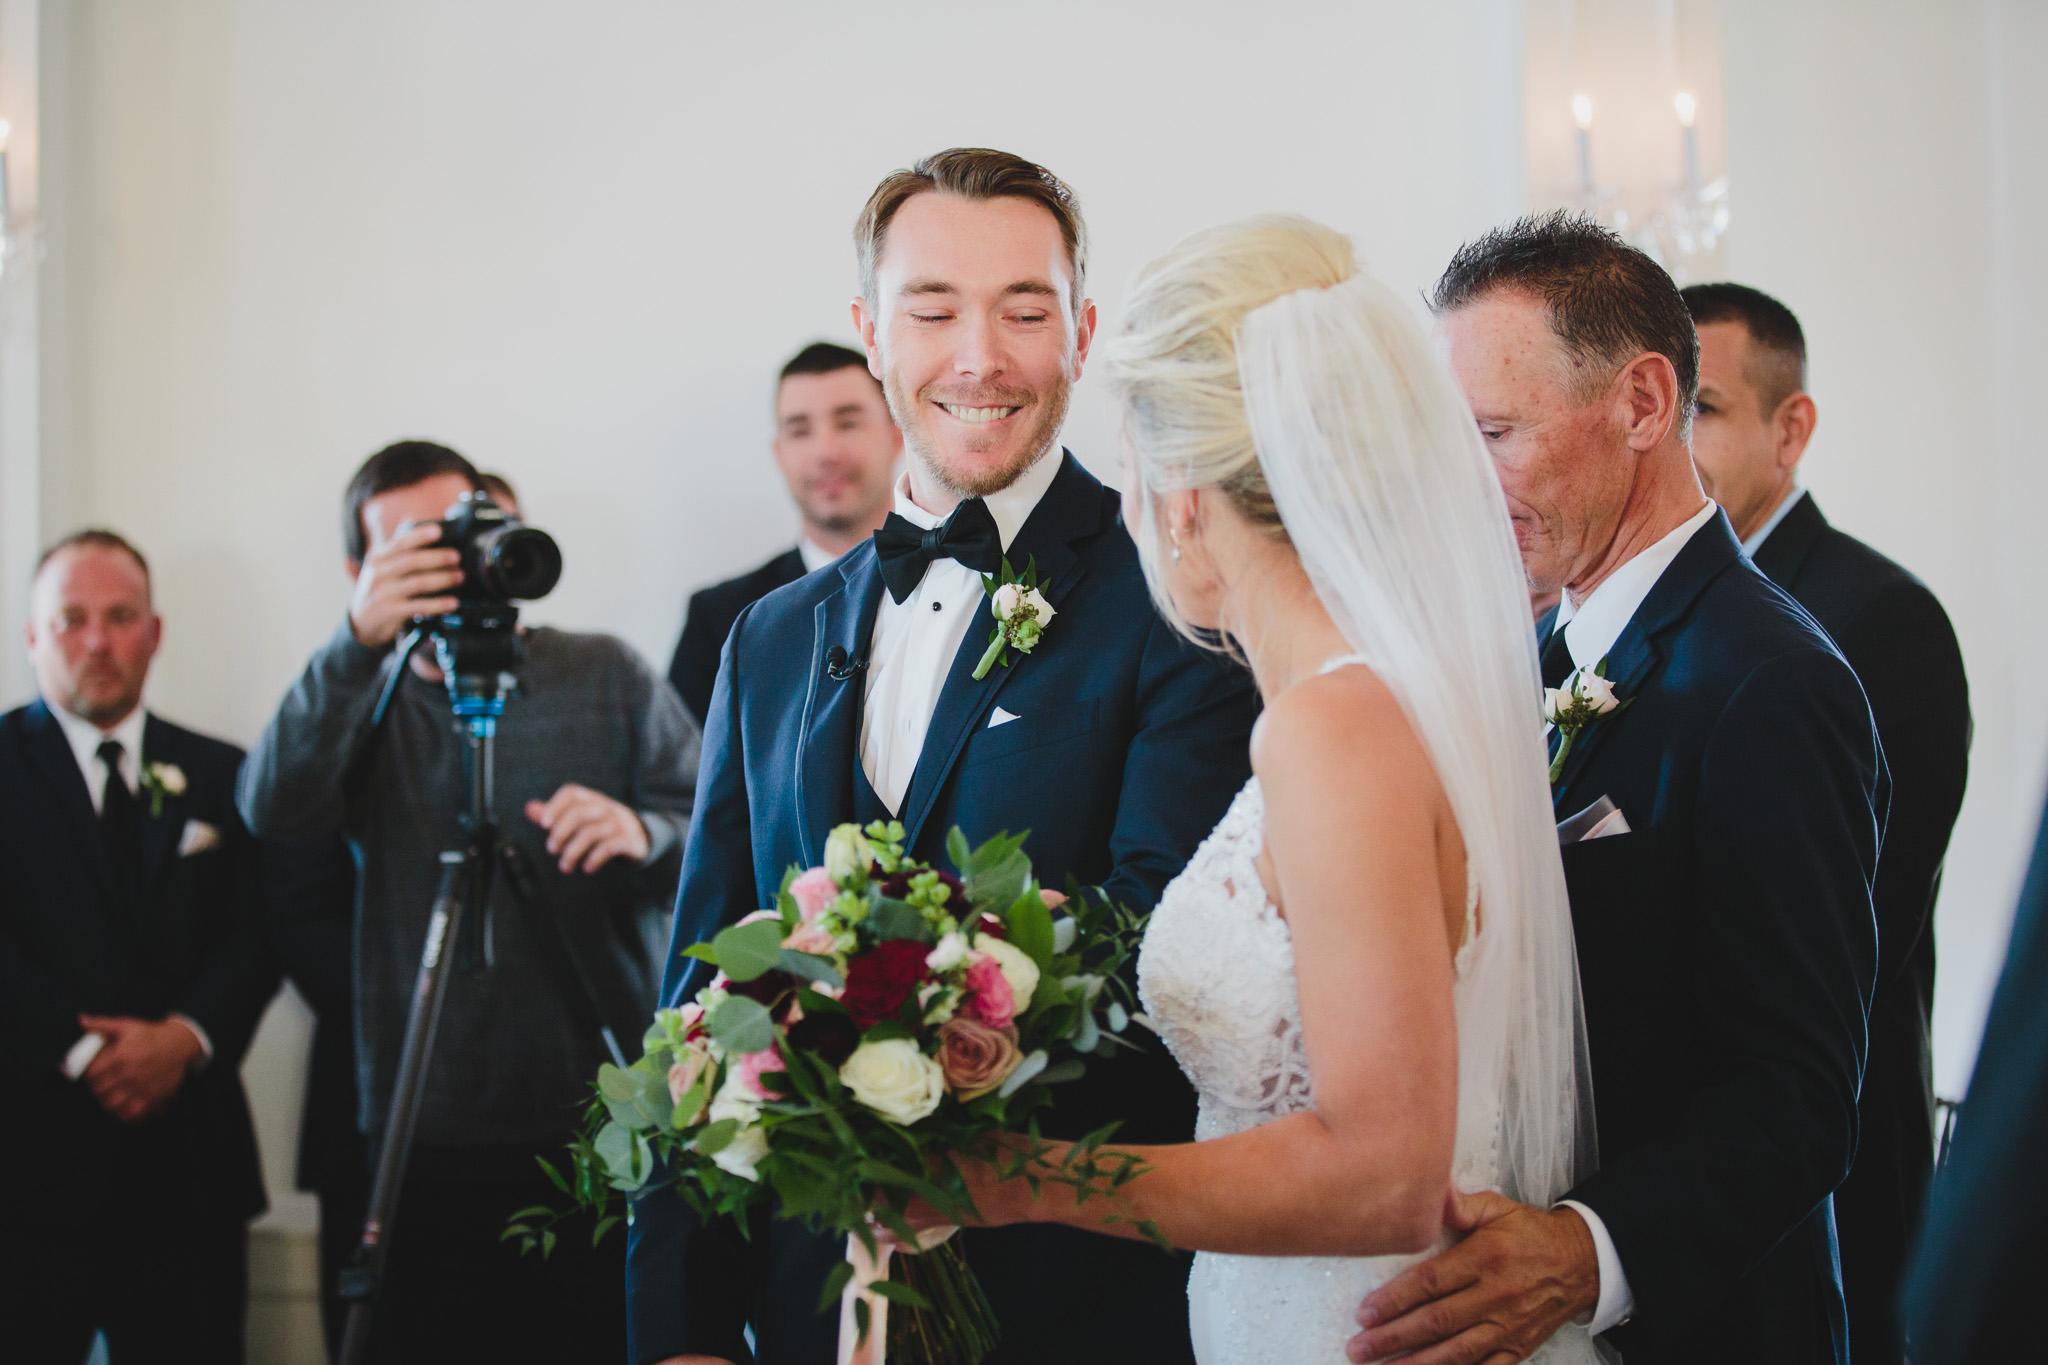 white-room-st-augustine-florida-wedding-ceremony